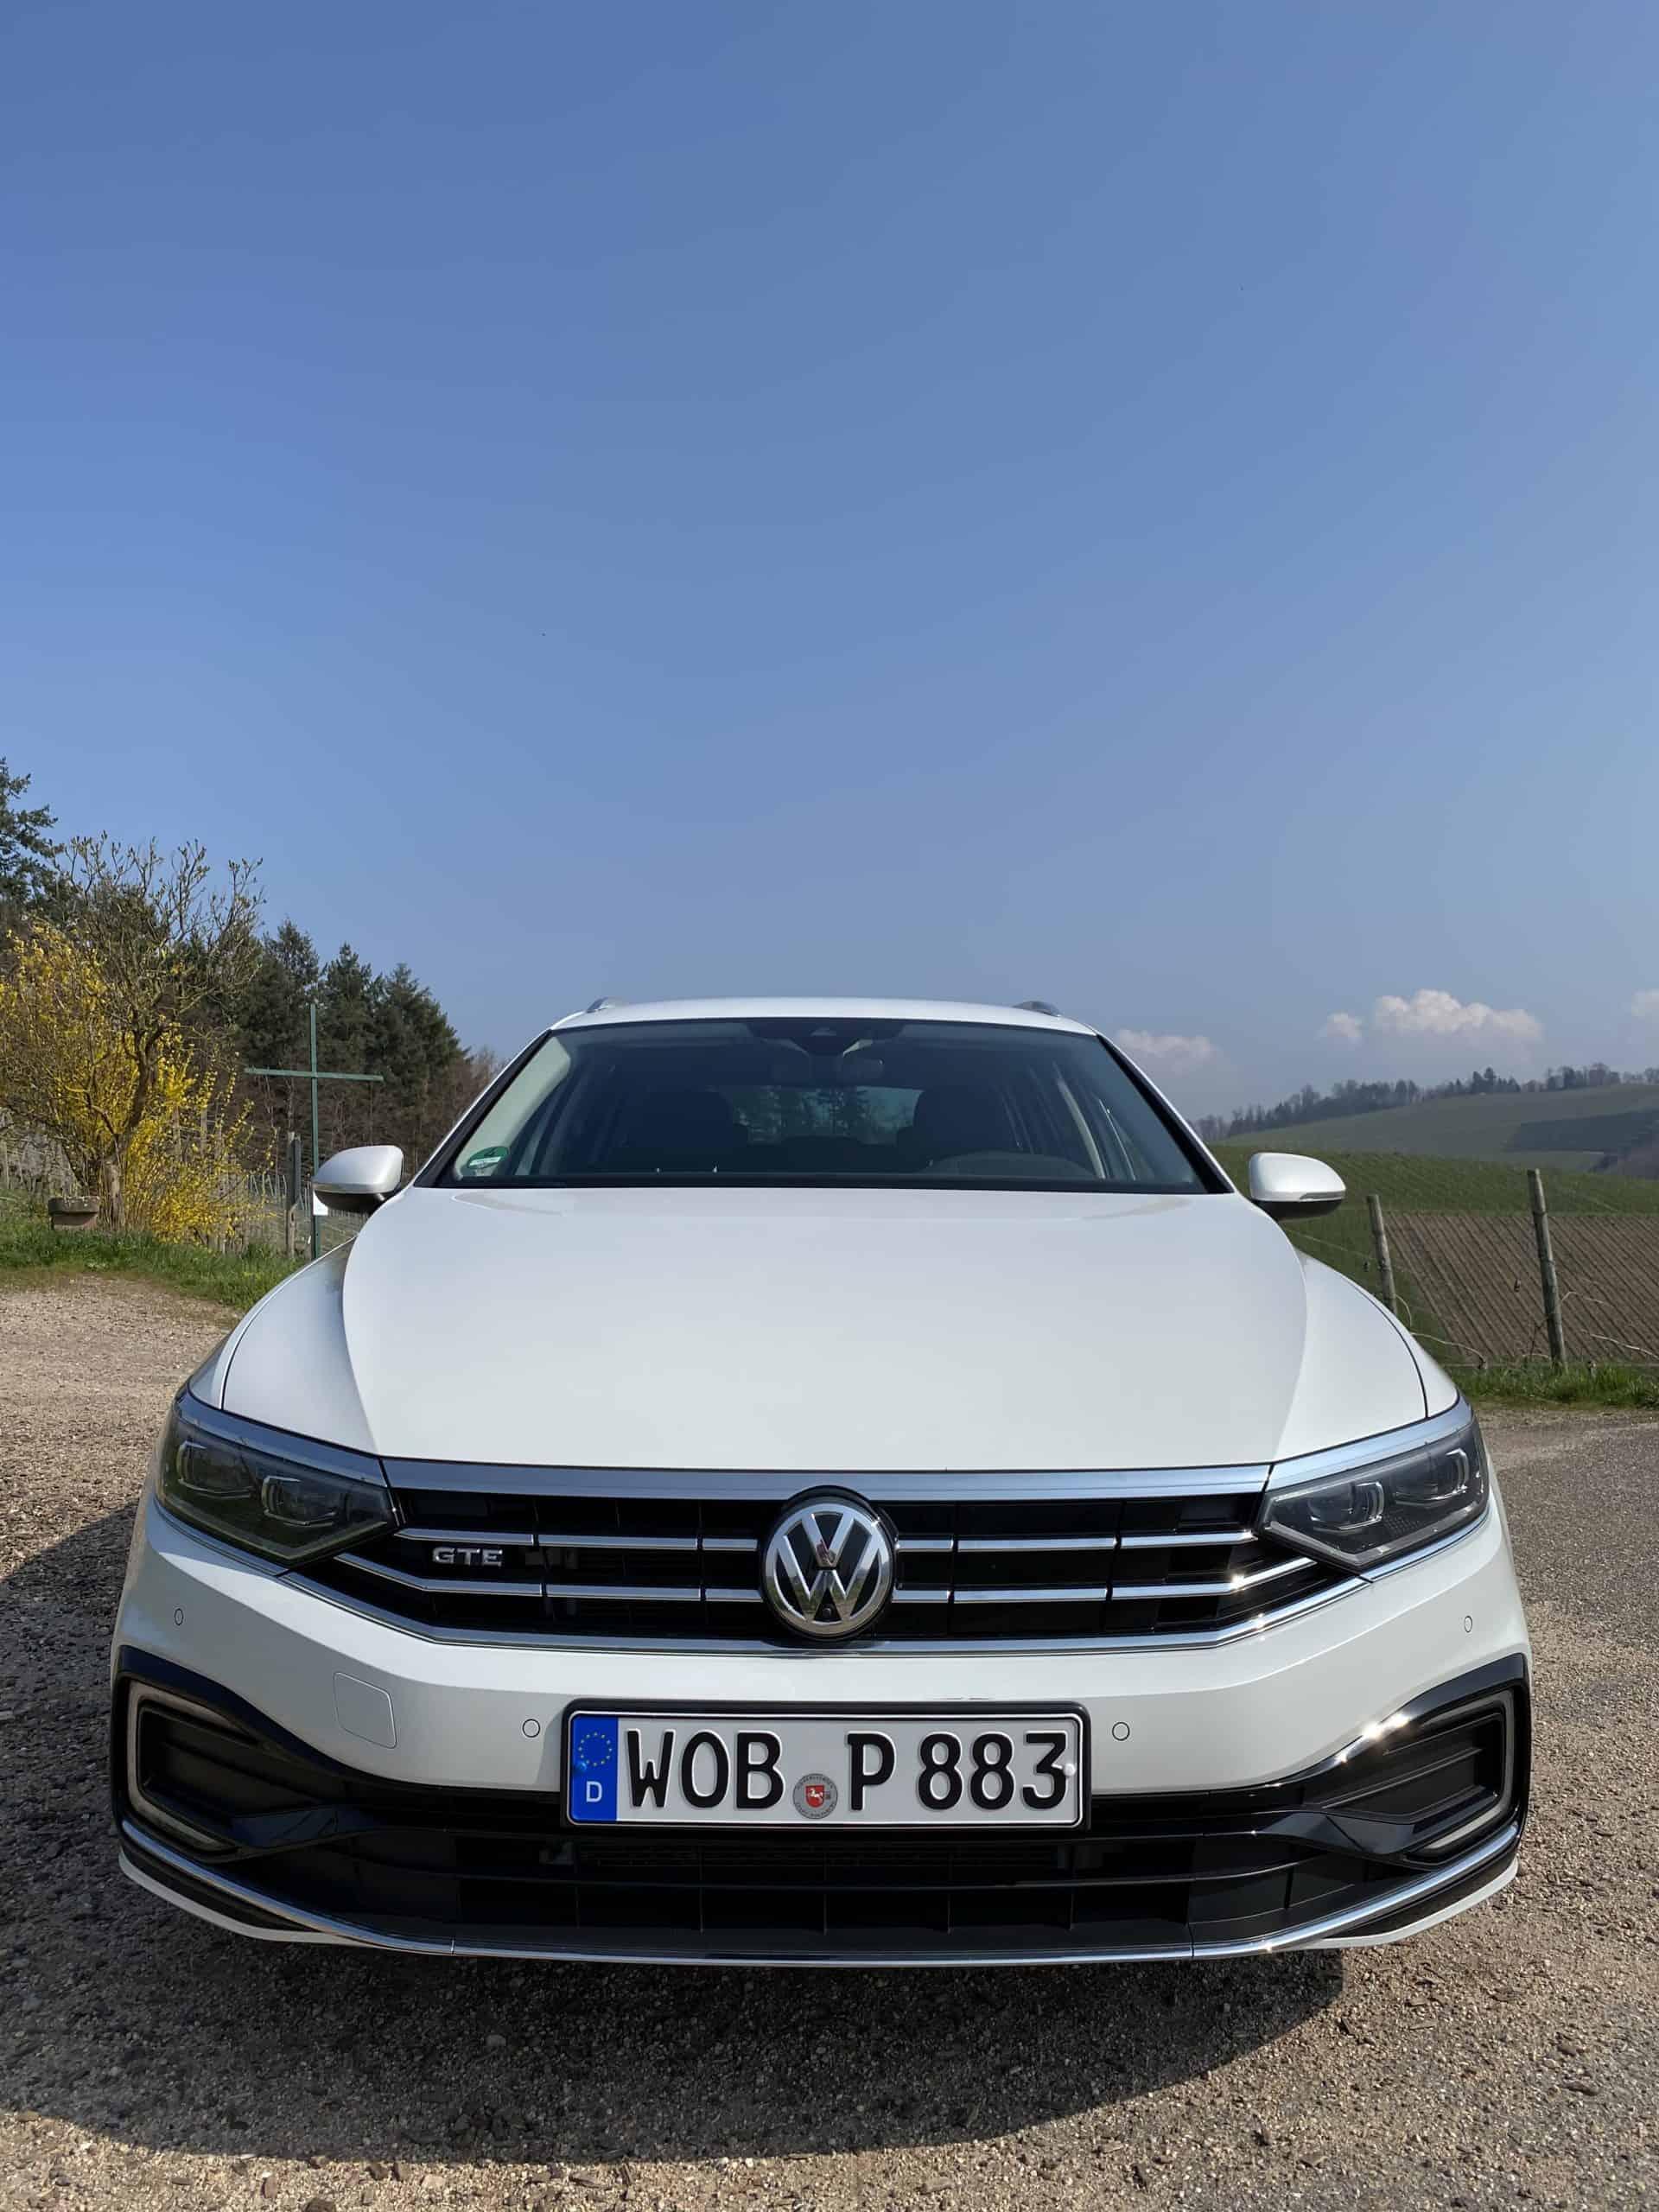 Neuer VW Passat B8.2 Variant GTE (218 PS) - Fahrbericht im Video